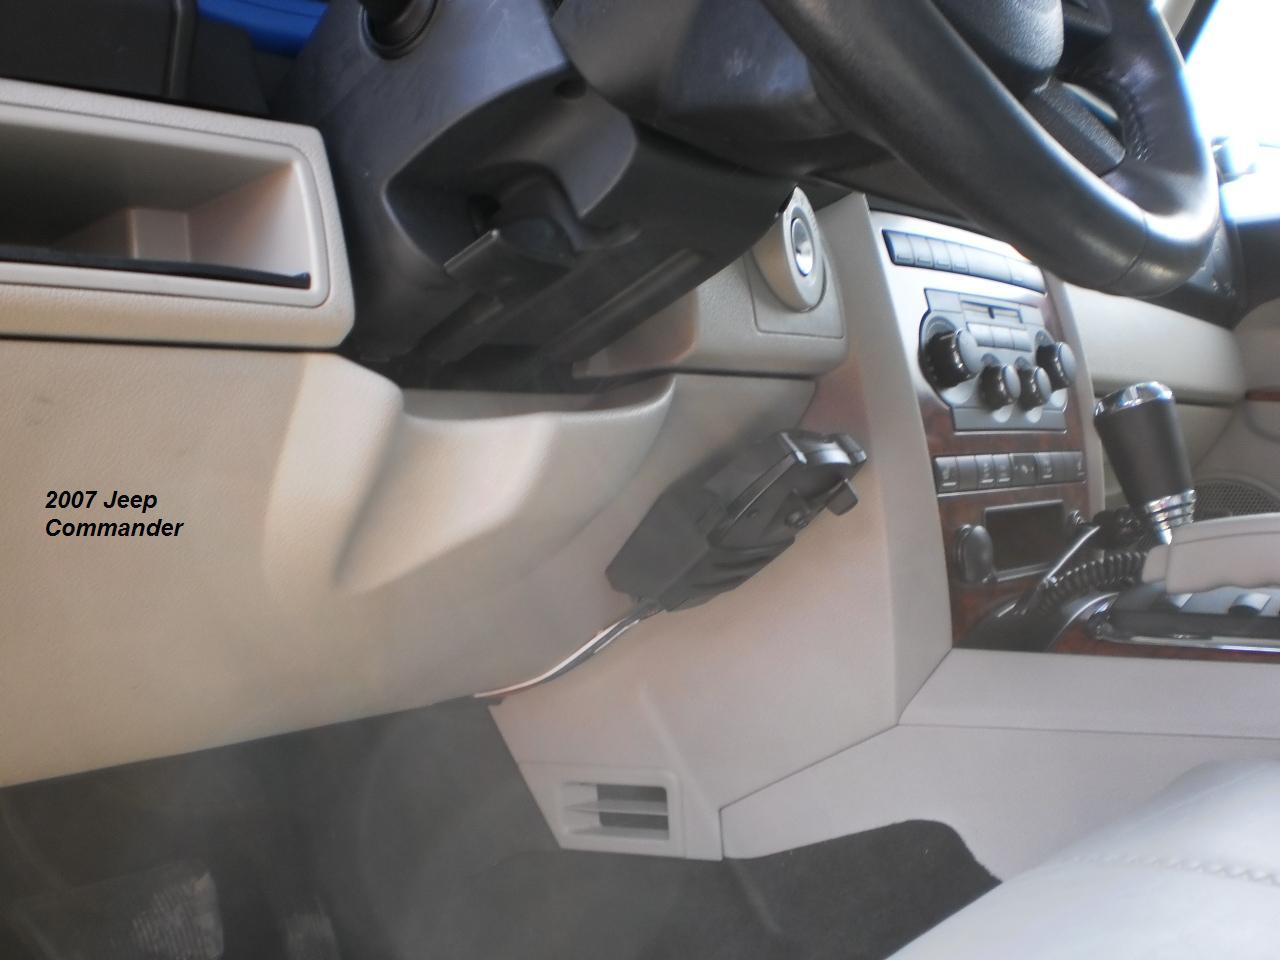 2007 Jeep Commander Truck Brake Controller Installation